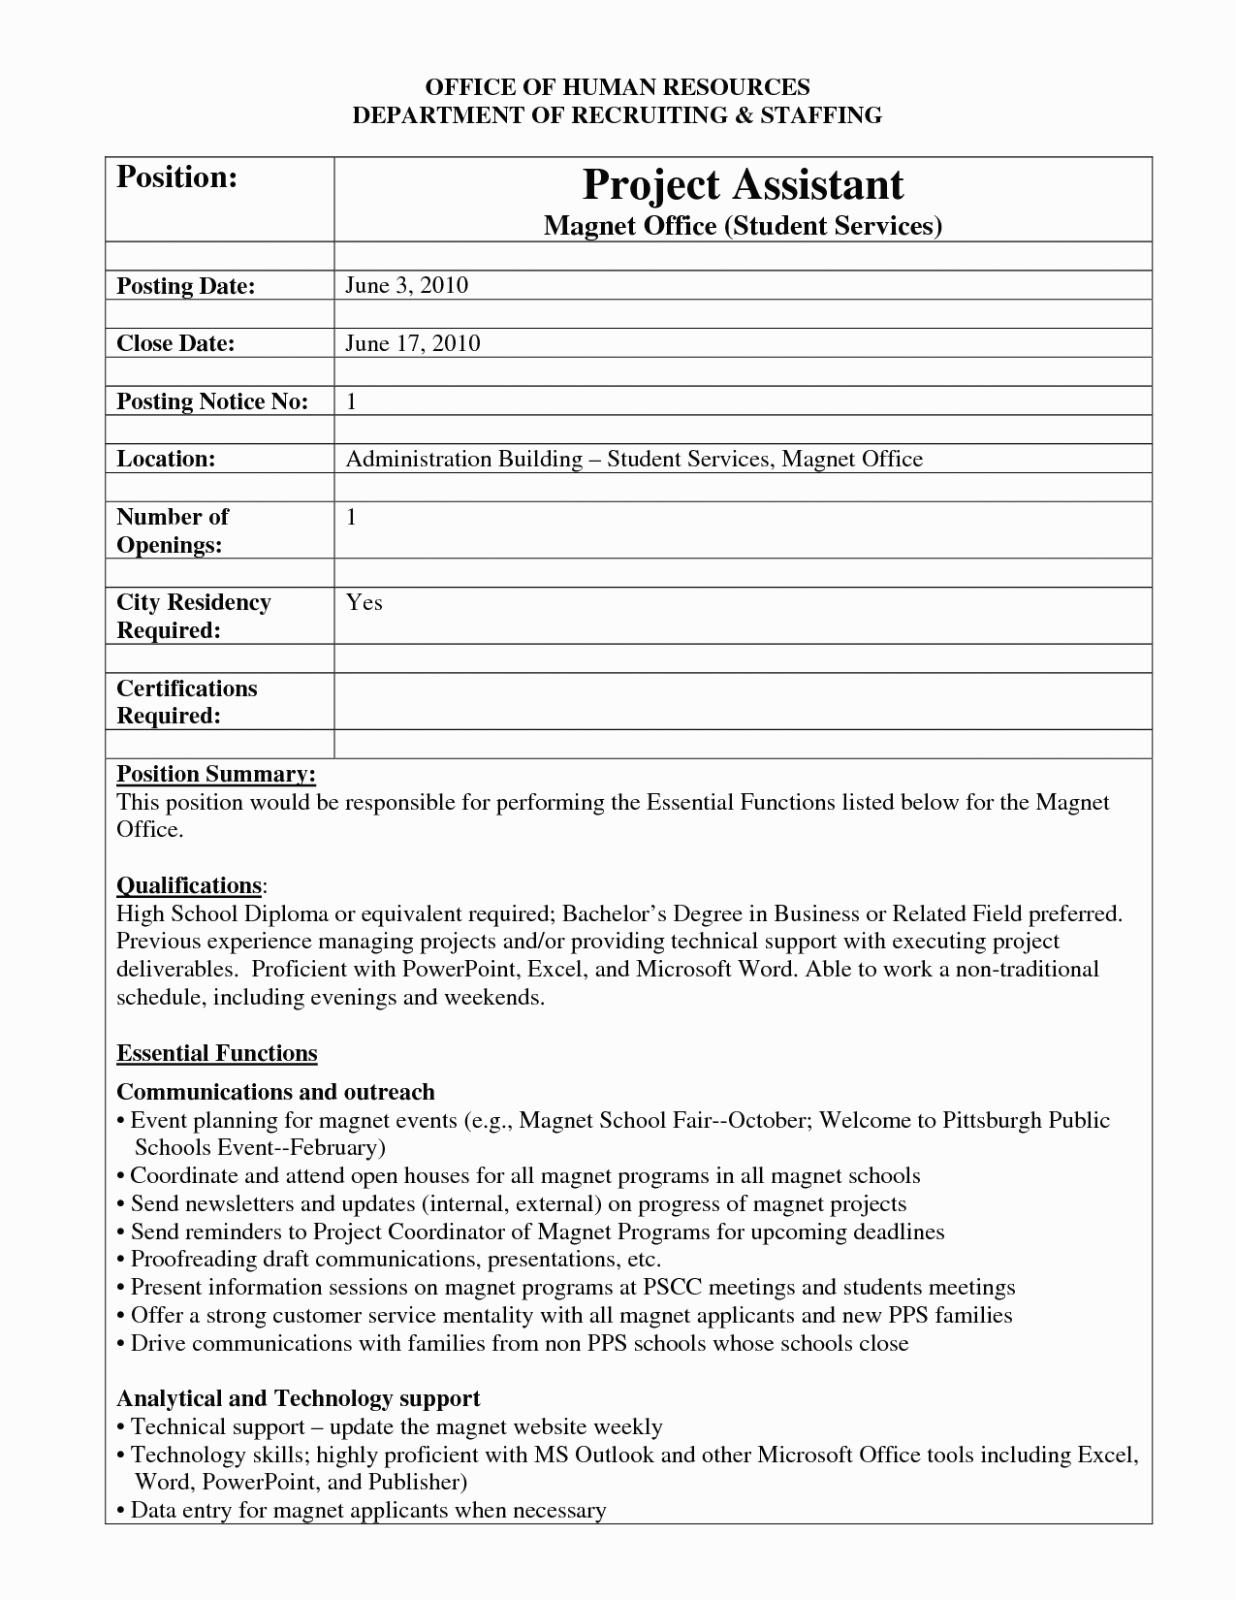 Internal Job Posting Template Word - Atlantaauctionco Pertaining To Internal Job Posting Template Word